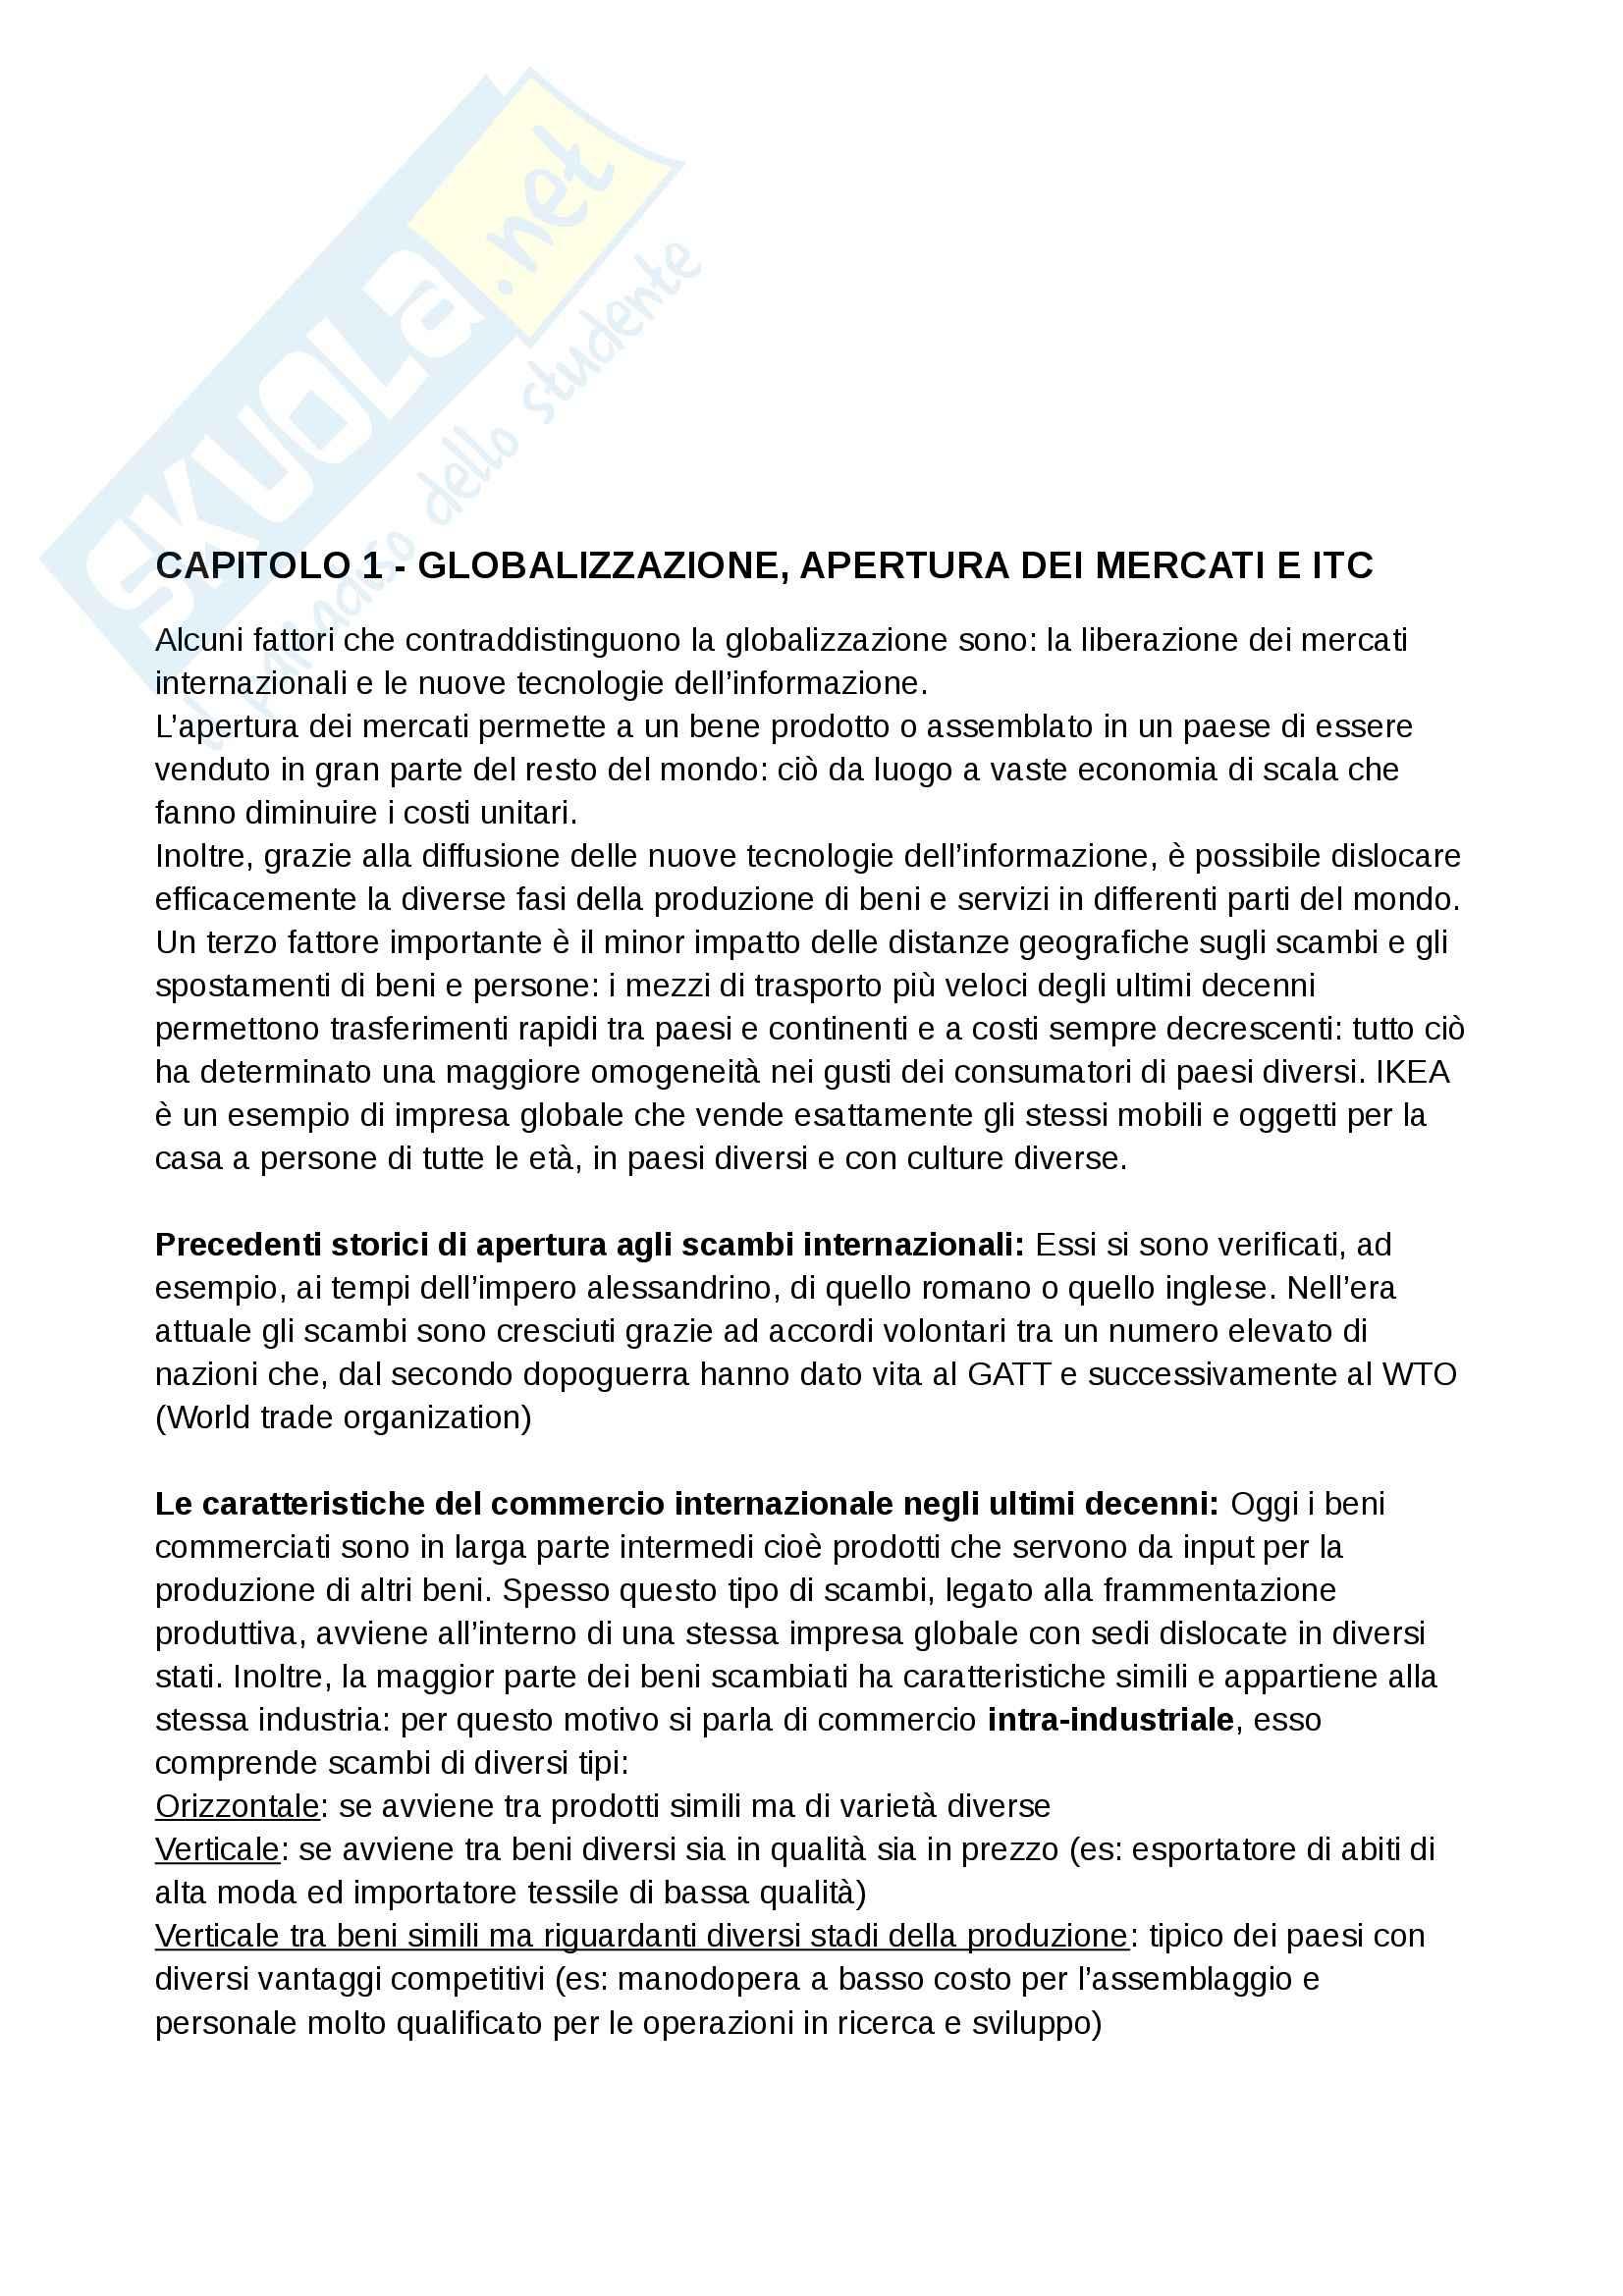 Riassunto esame Marketing Internazionale, prof. Bursi, libro consigliato Marketing Internazionale, Mc Graw Hill - Capp. 1 3 4 8 9 10 11